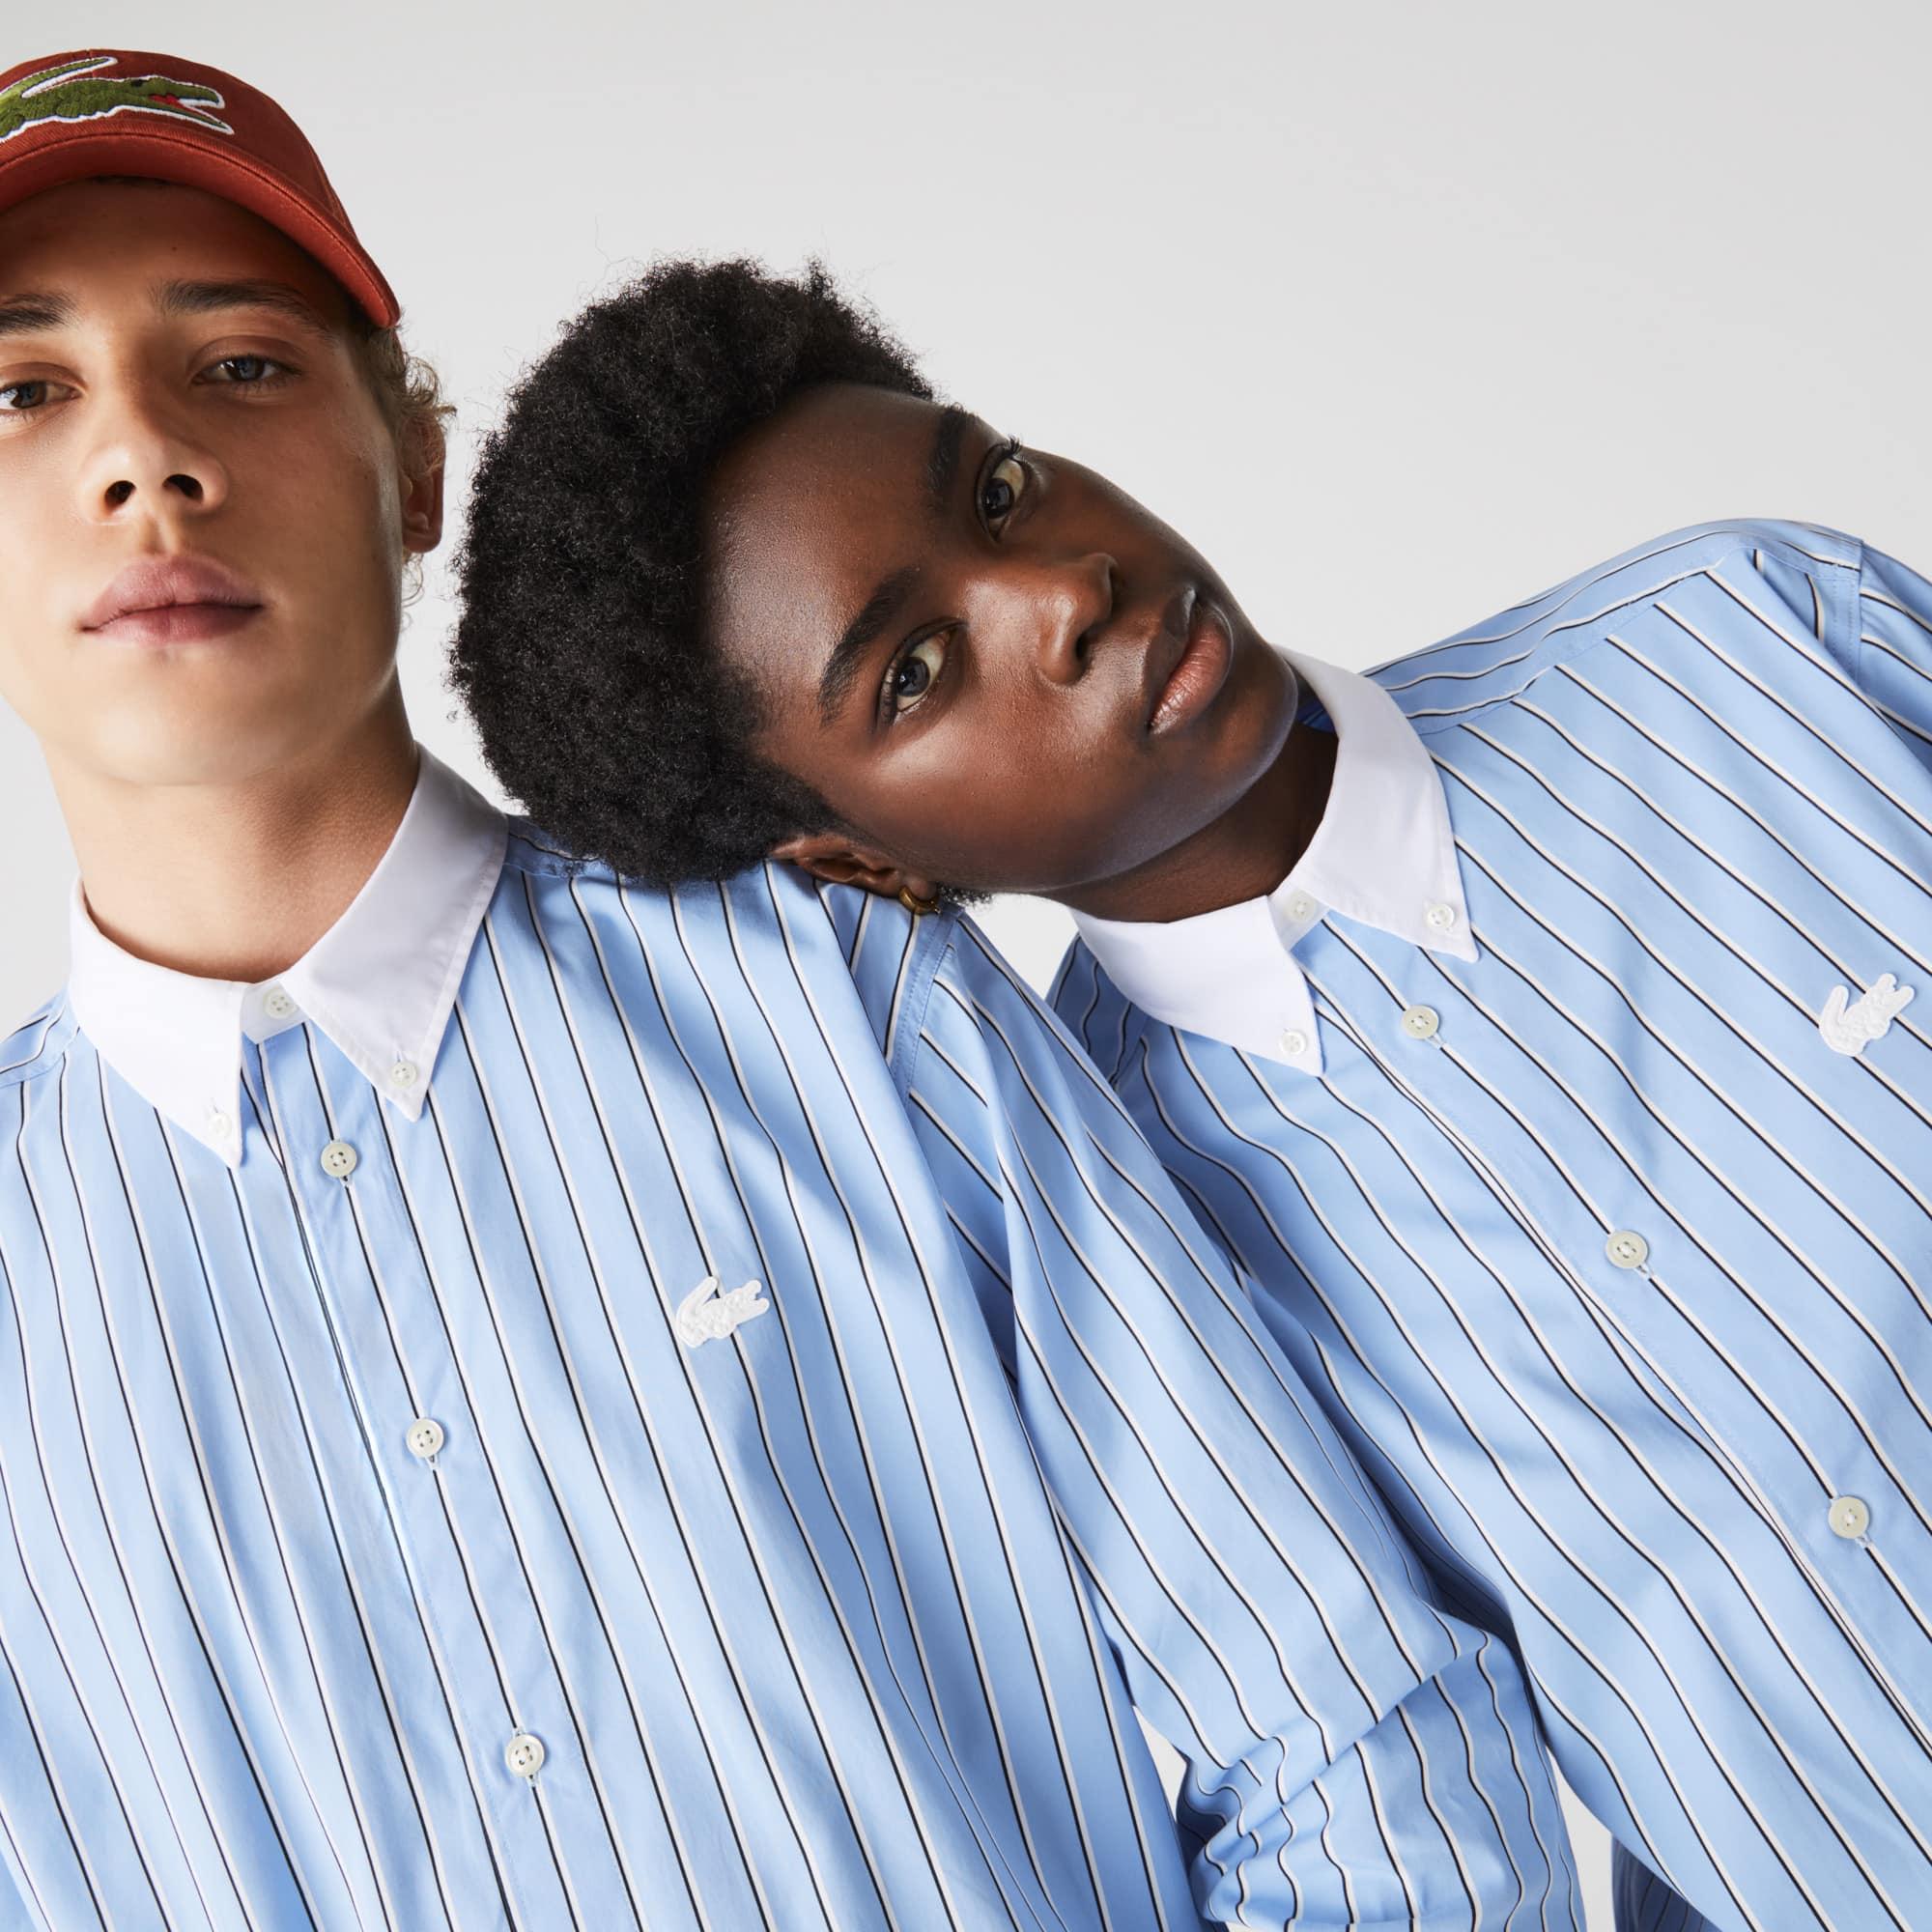 قميص قطن مقلم مجموعة Lacoste LIVE للجنسين